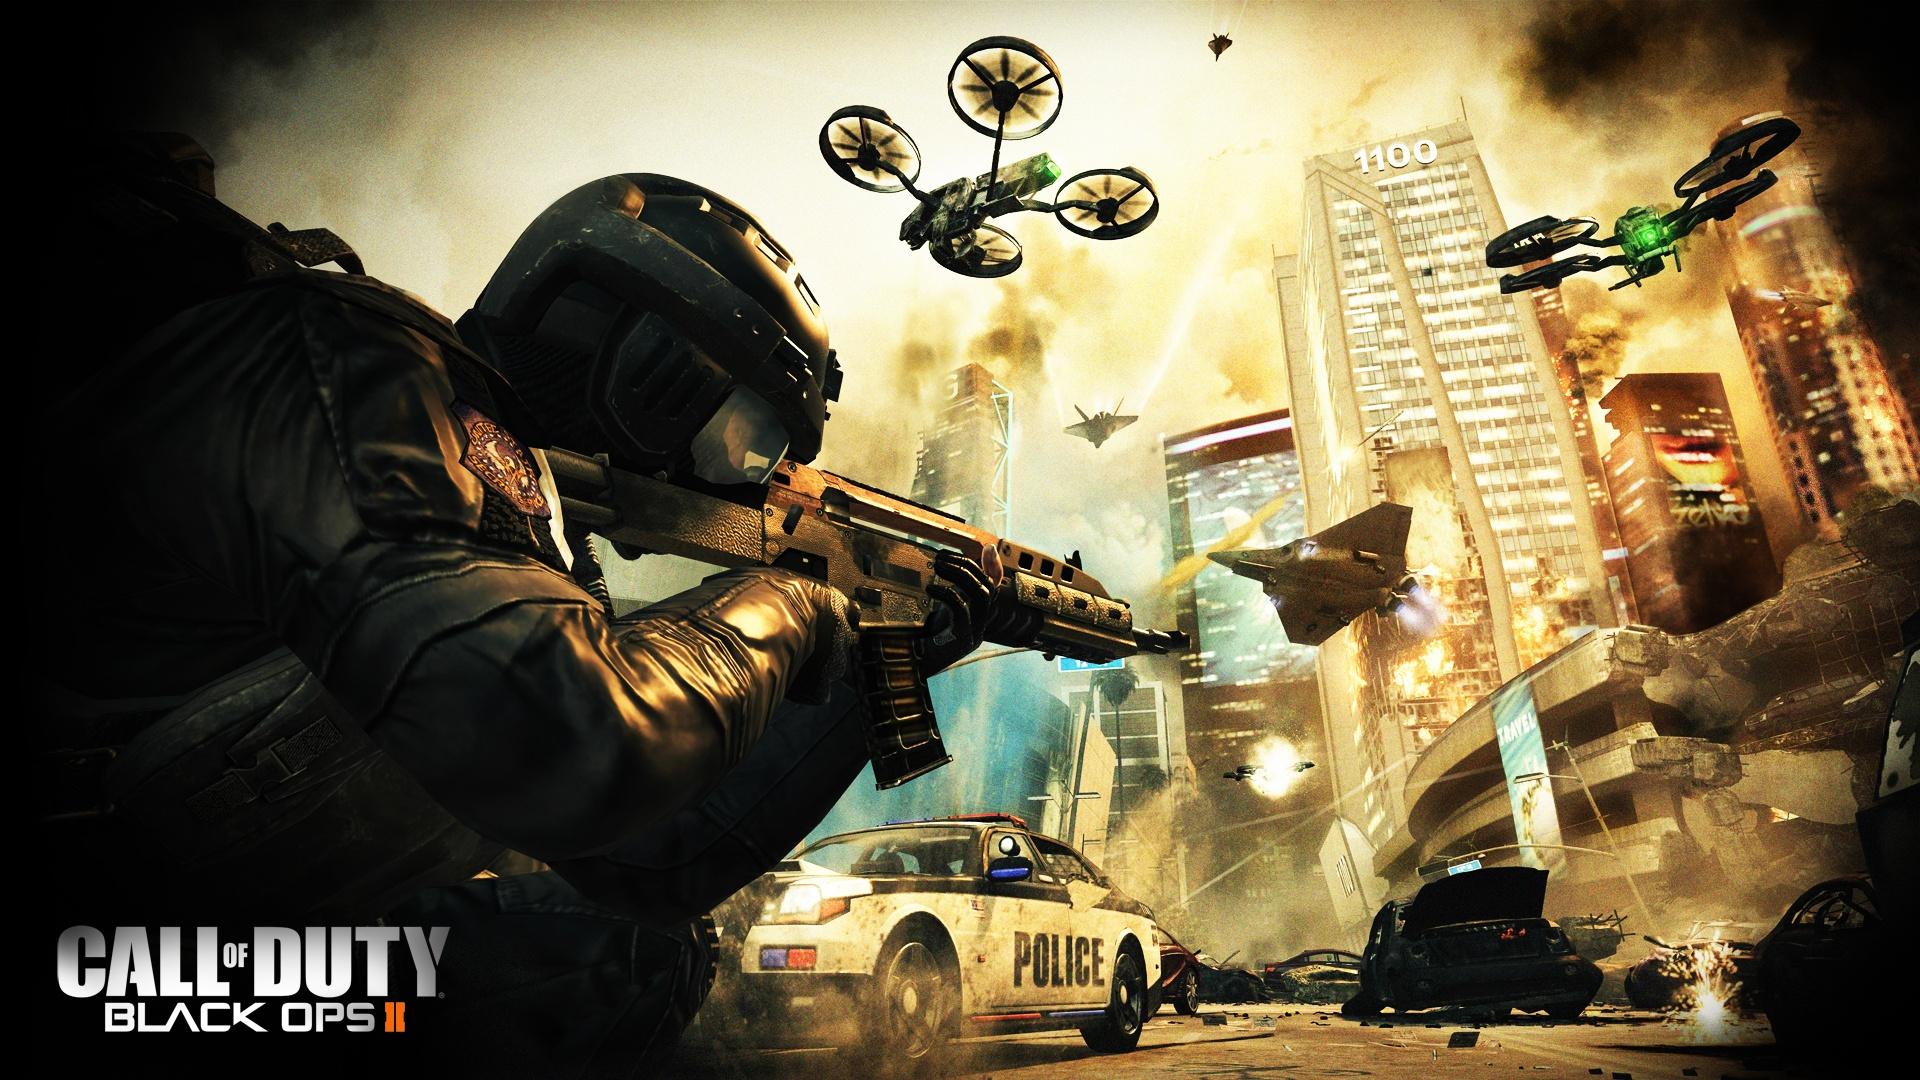 Call of Duty Black Ops 2 Wallpaper HD 1080p HD Desktop Wallpapers 1920x1080